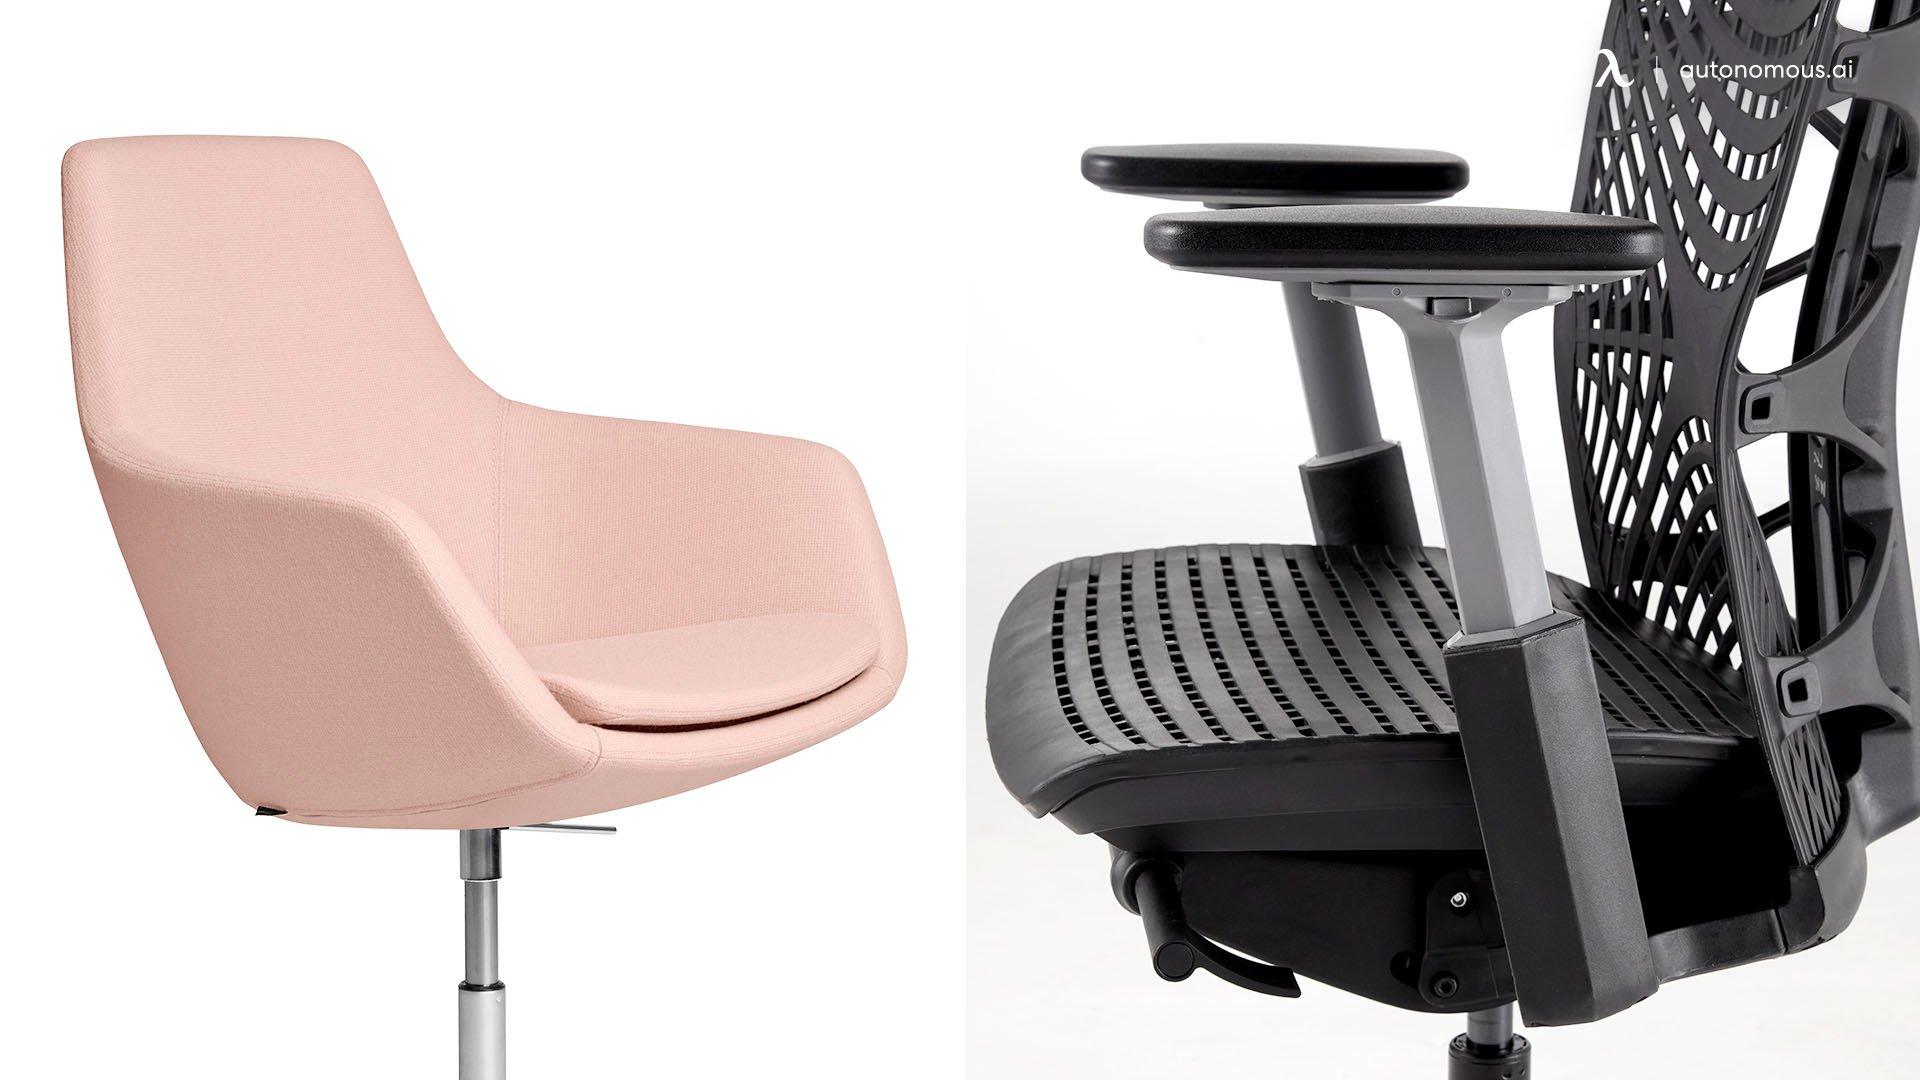 Seat shape